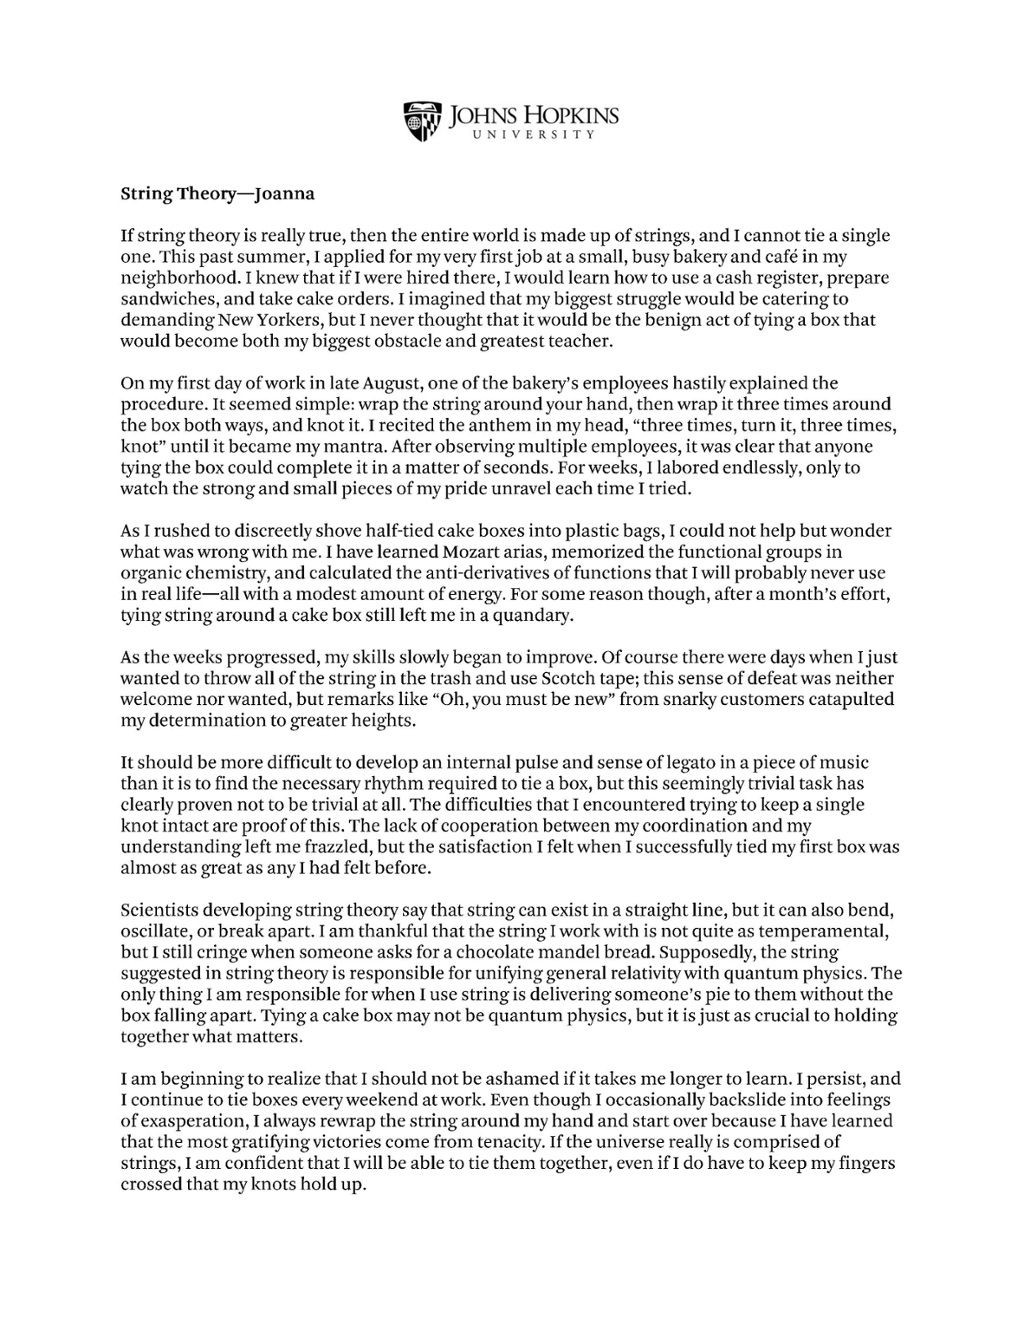 001 Jhu Essays That Worked Essay Wonderful 2019 Johns Hopkins Large